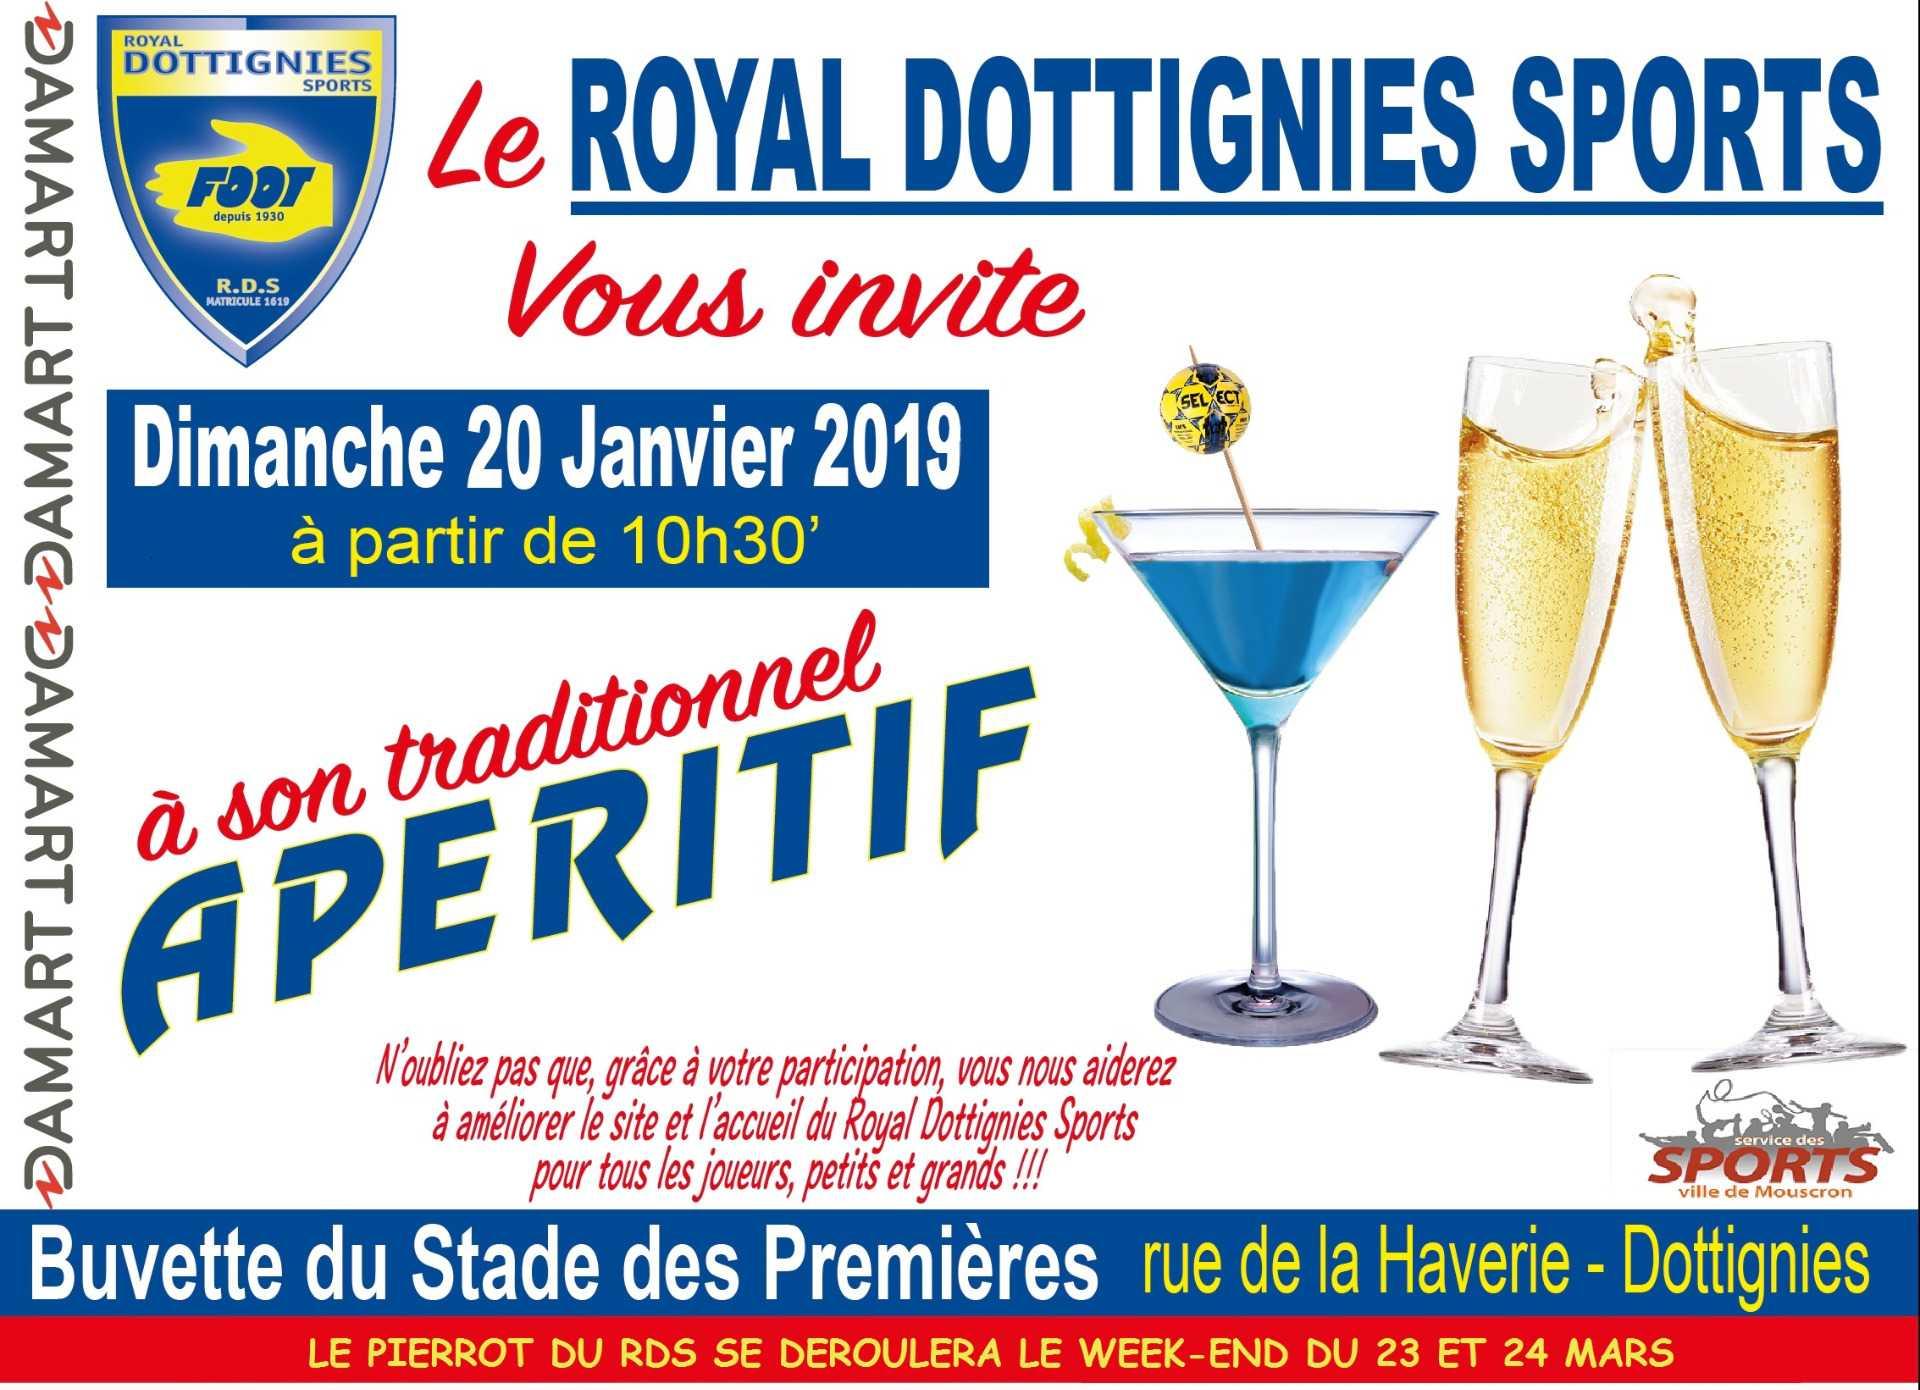 Apero du Royal Dottignies Sports